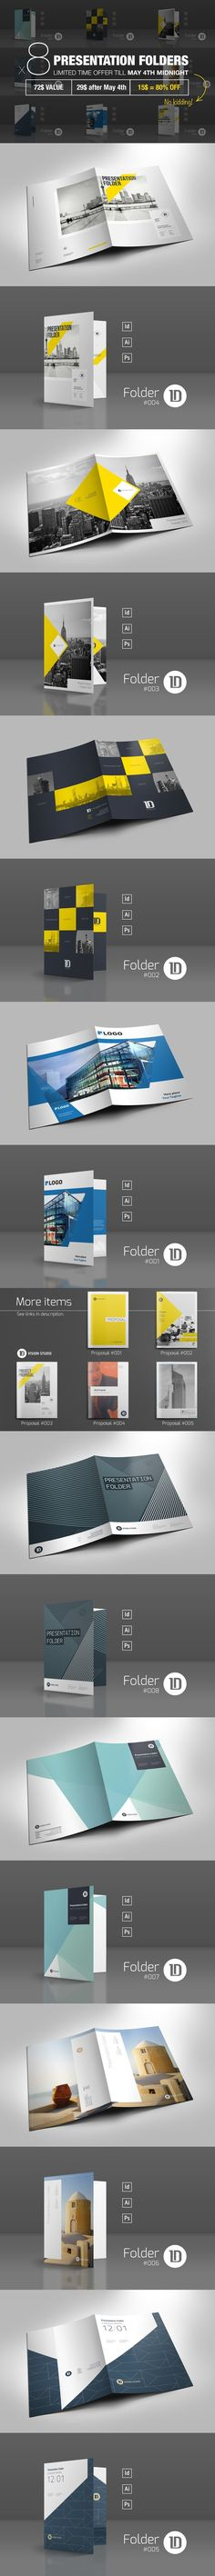 Bundle: 8 Presentation Folders